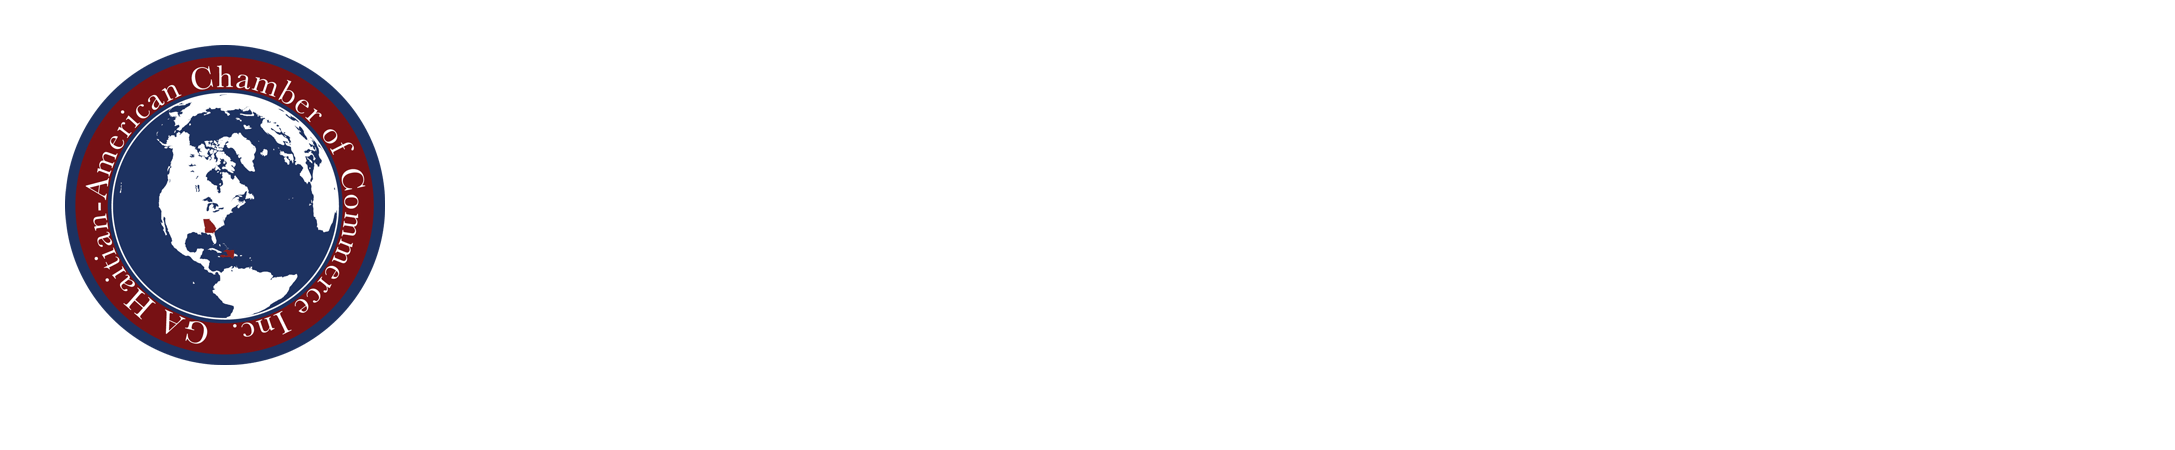 GA Haitian-American Chamber of Commerce, Inc.